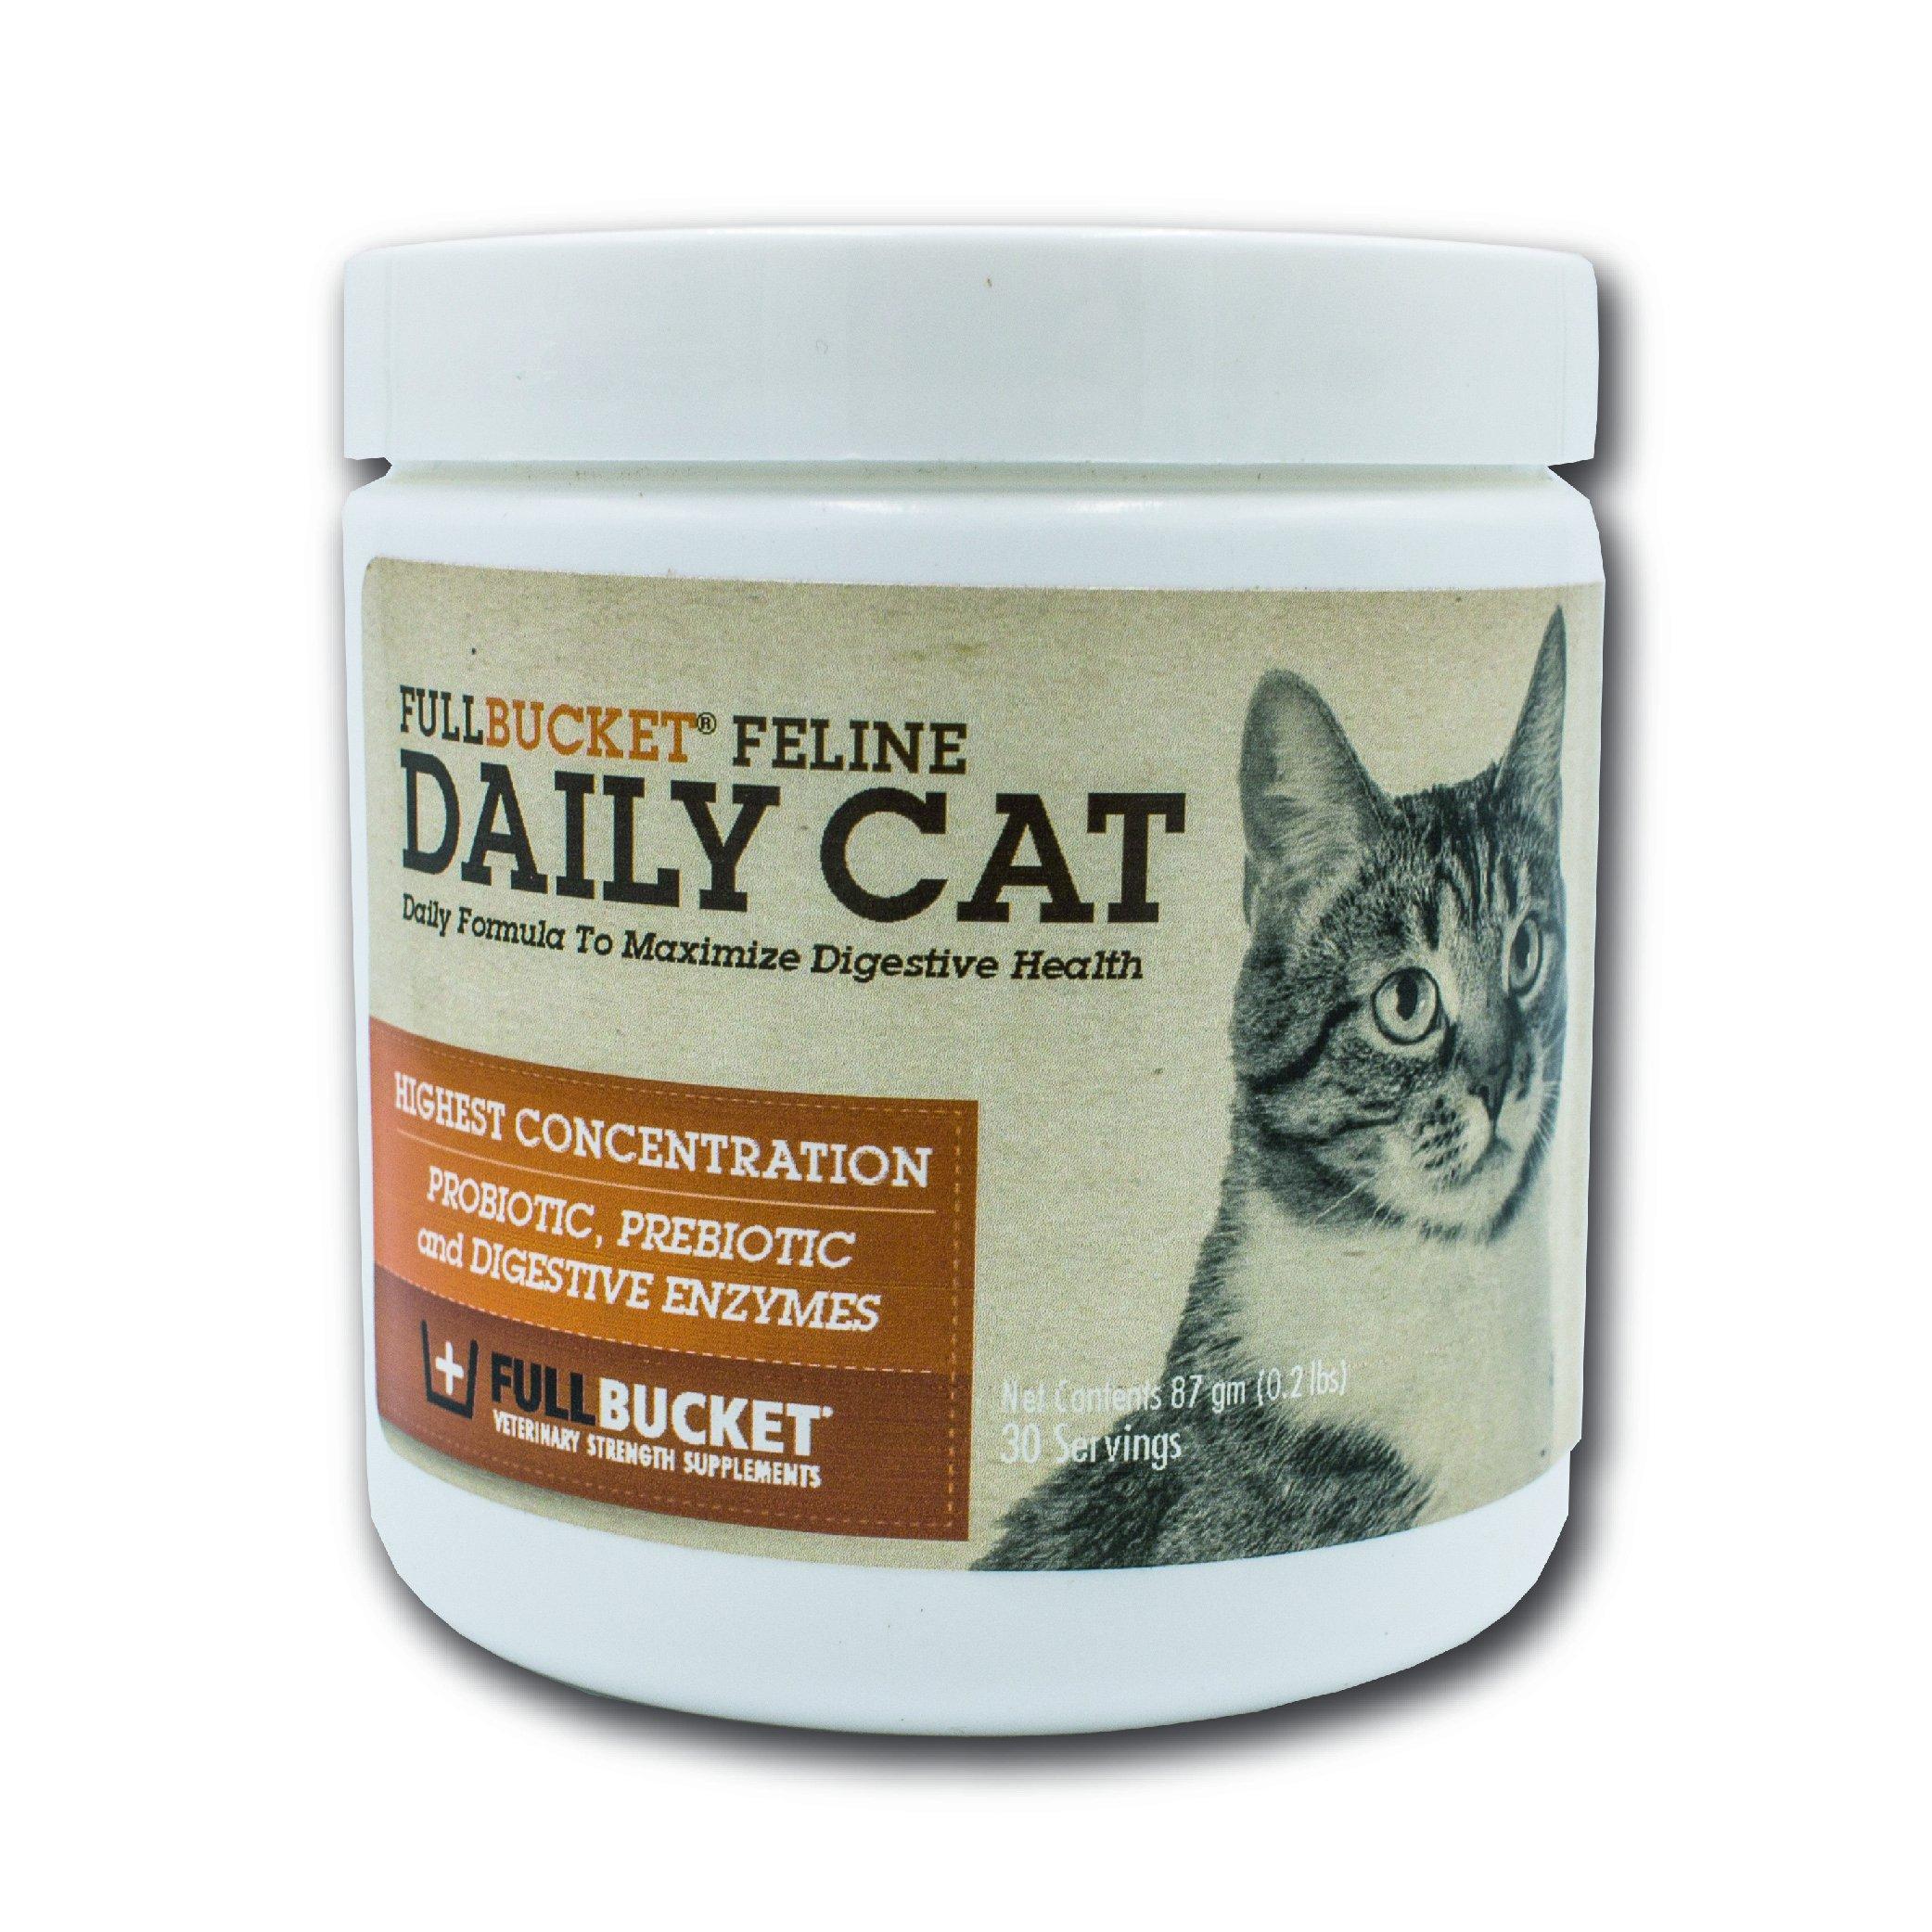 FullBucket Daily Cat Probiotic Powder 87gm by FullBucket